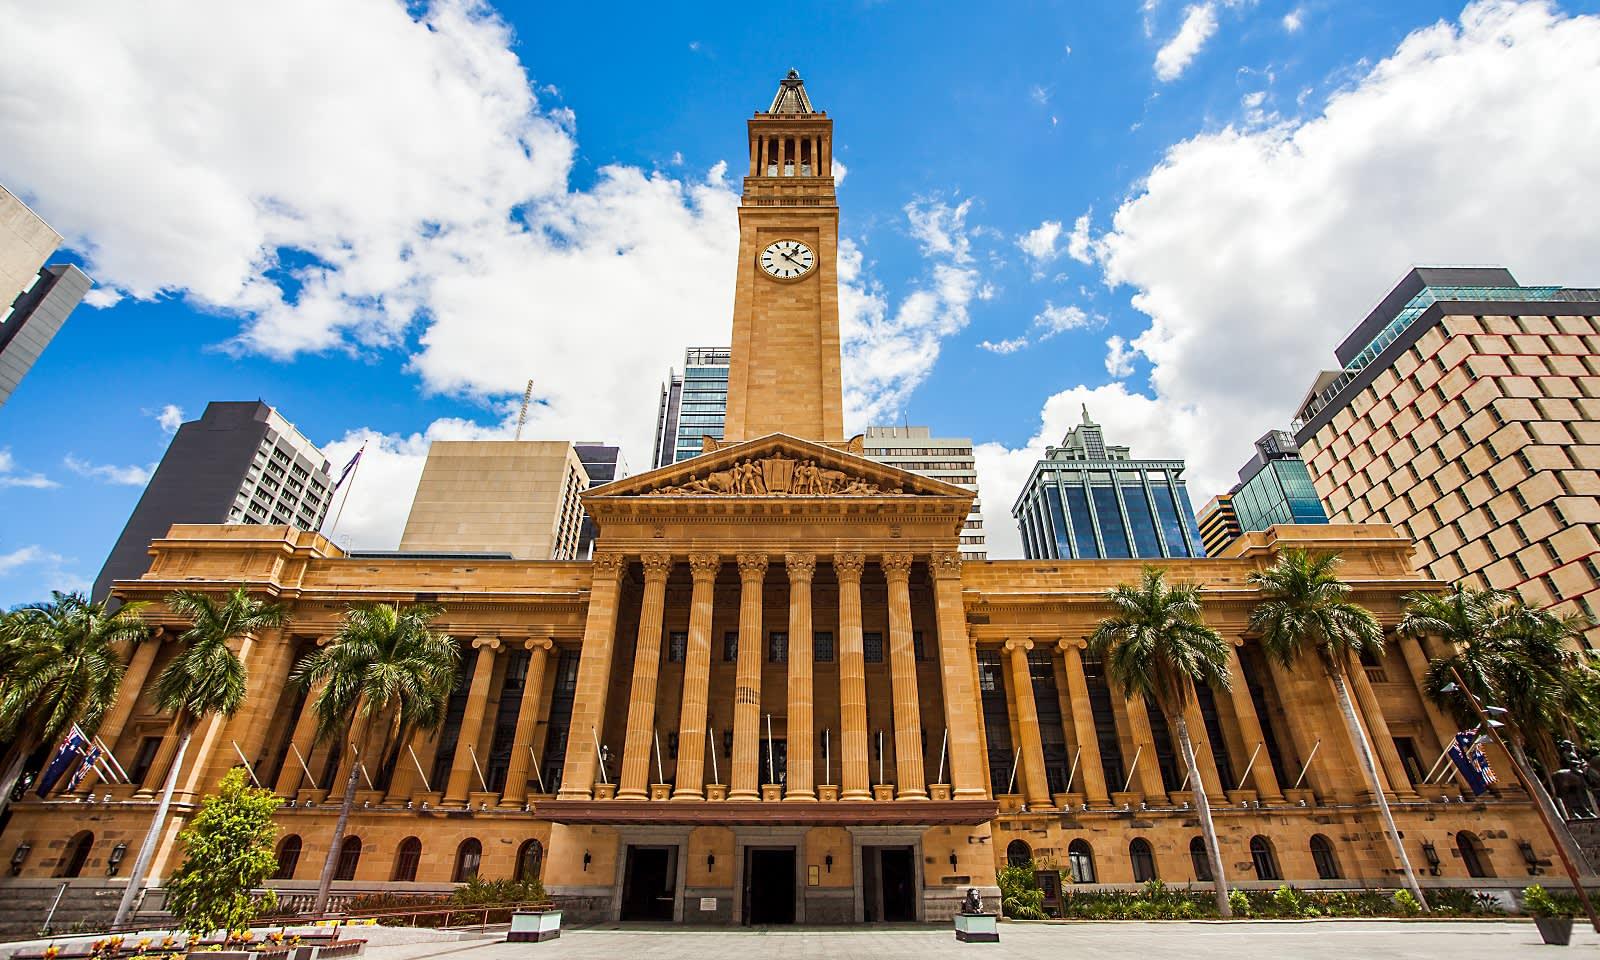 Brisbane - Heritage building - History of Australia